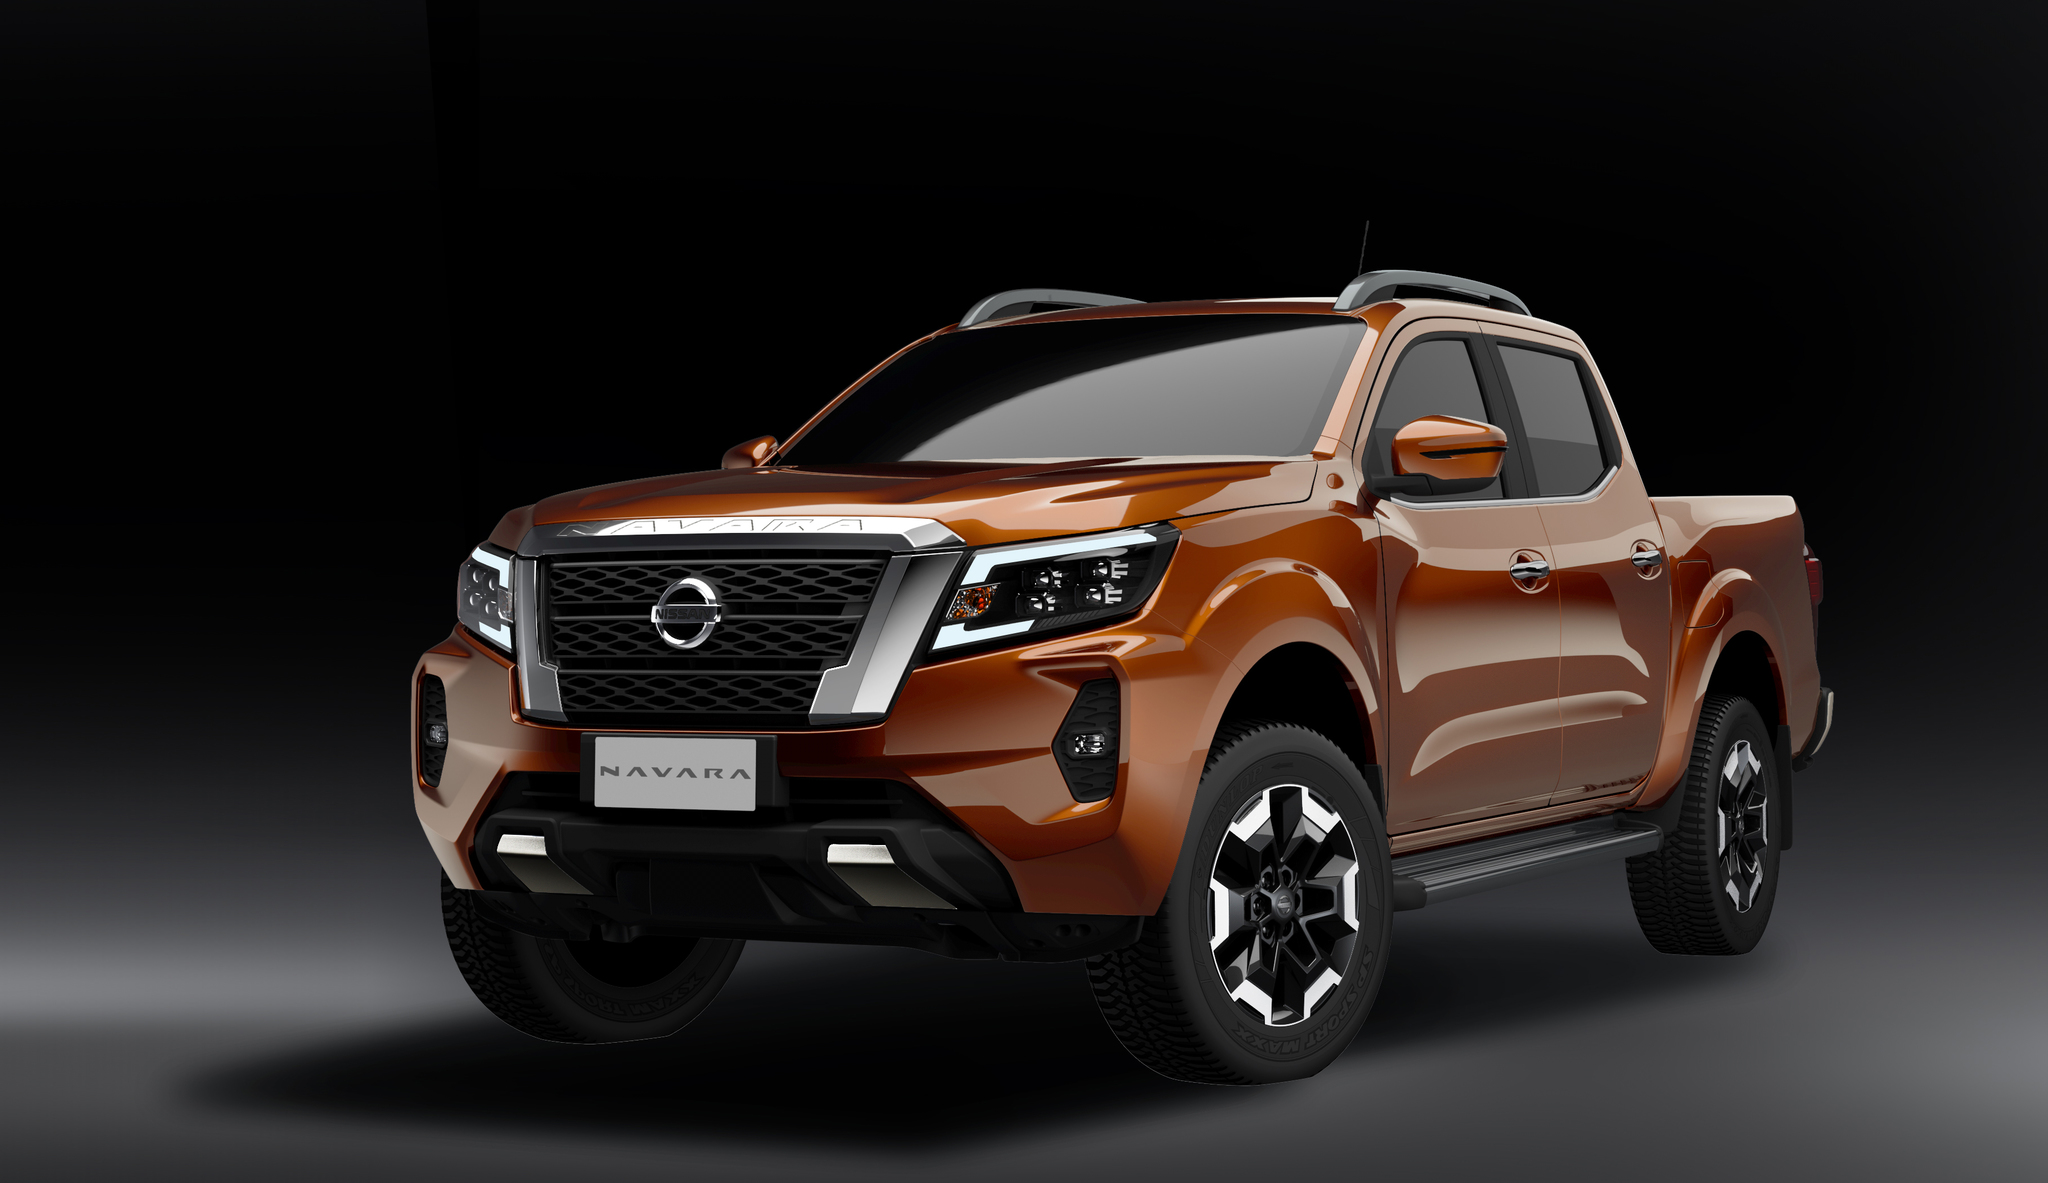 2021 nissan navara and frontier facelift have titan design